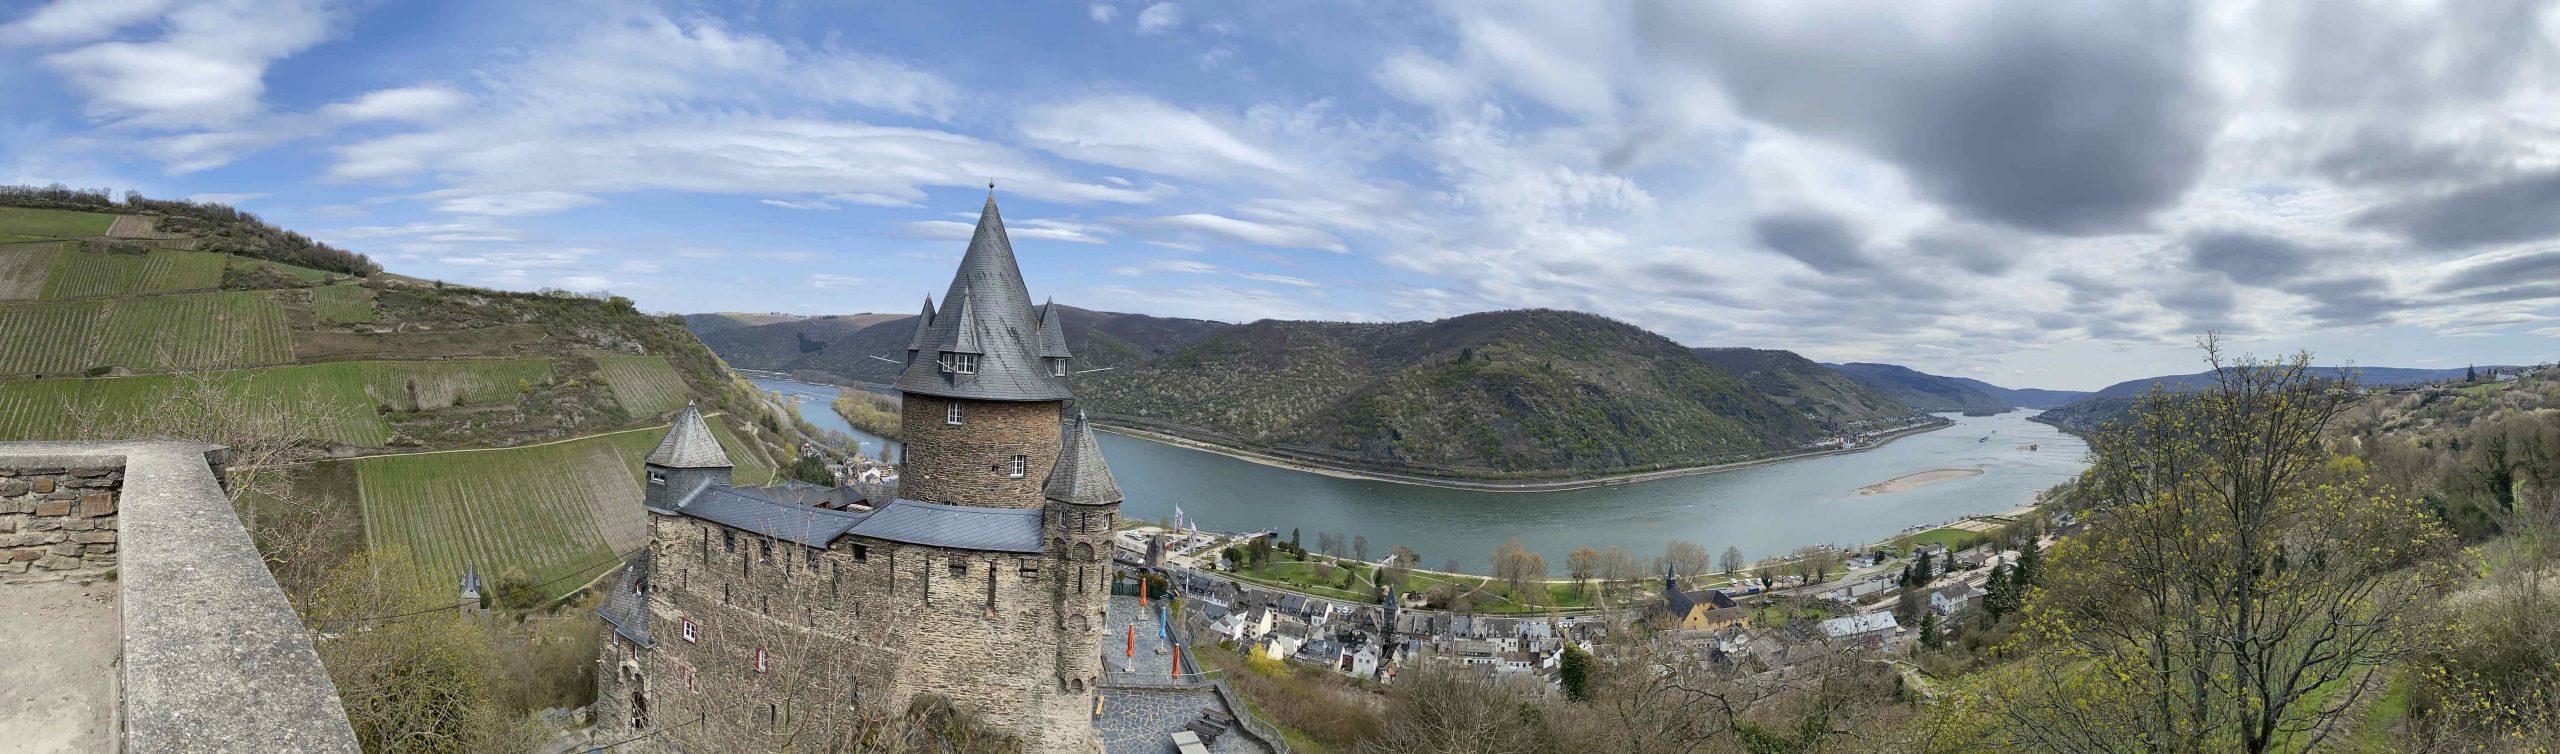 Blick über die Burg Stahleck